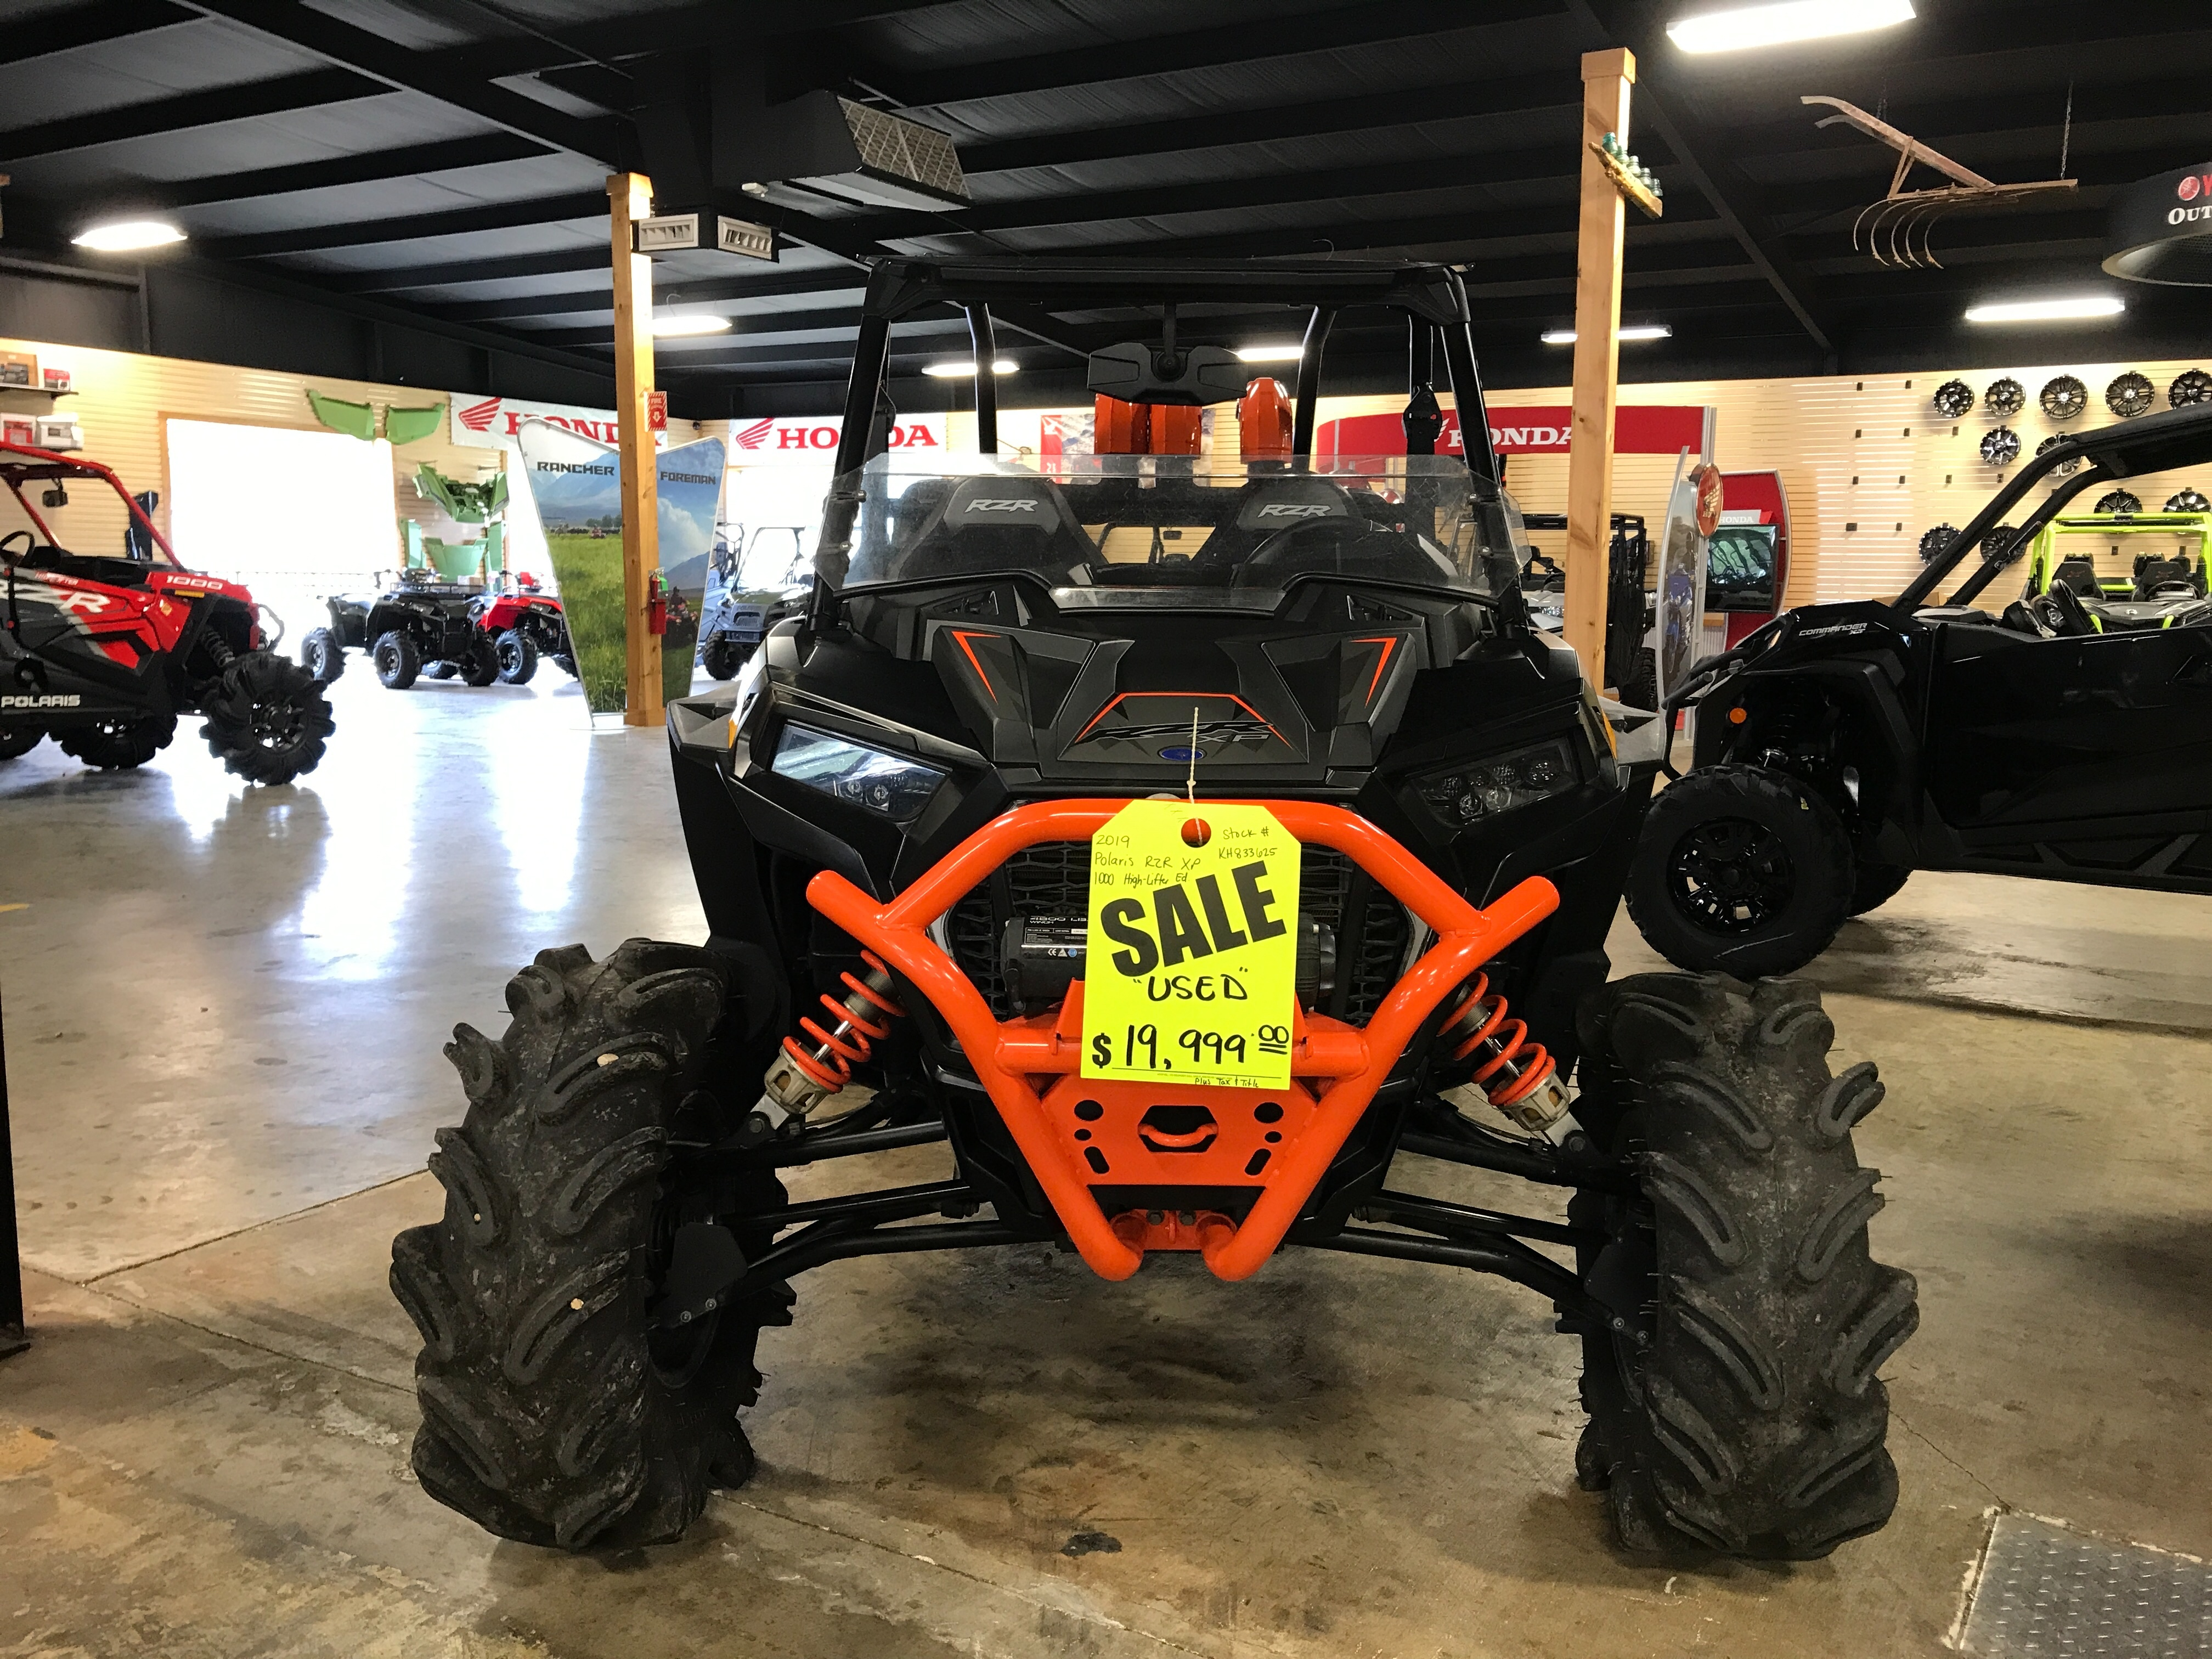 2019 POLARIS 1000 XP HL High Lifter Edition at ATV Zone, LLC